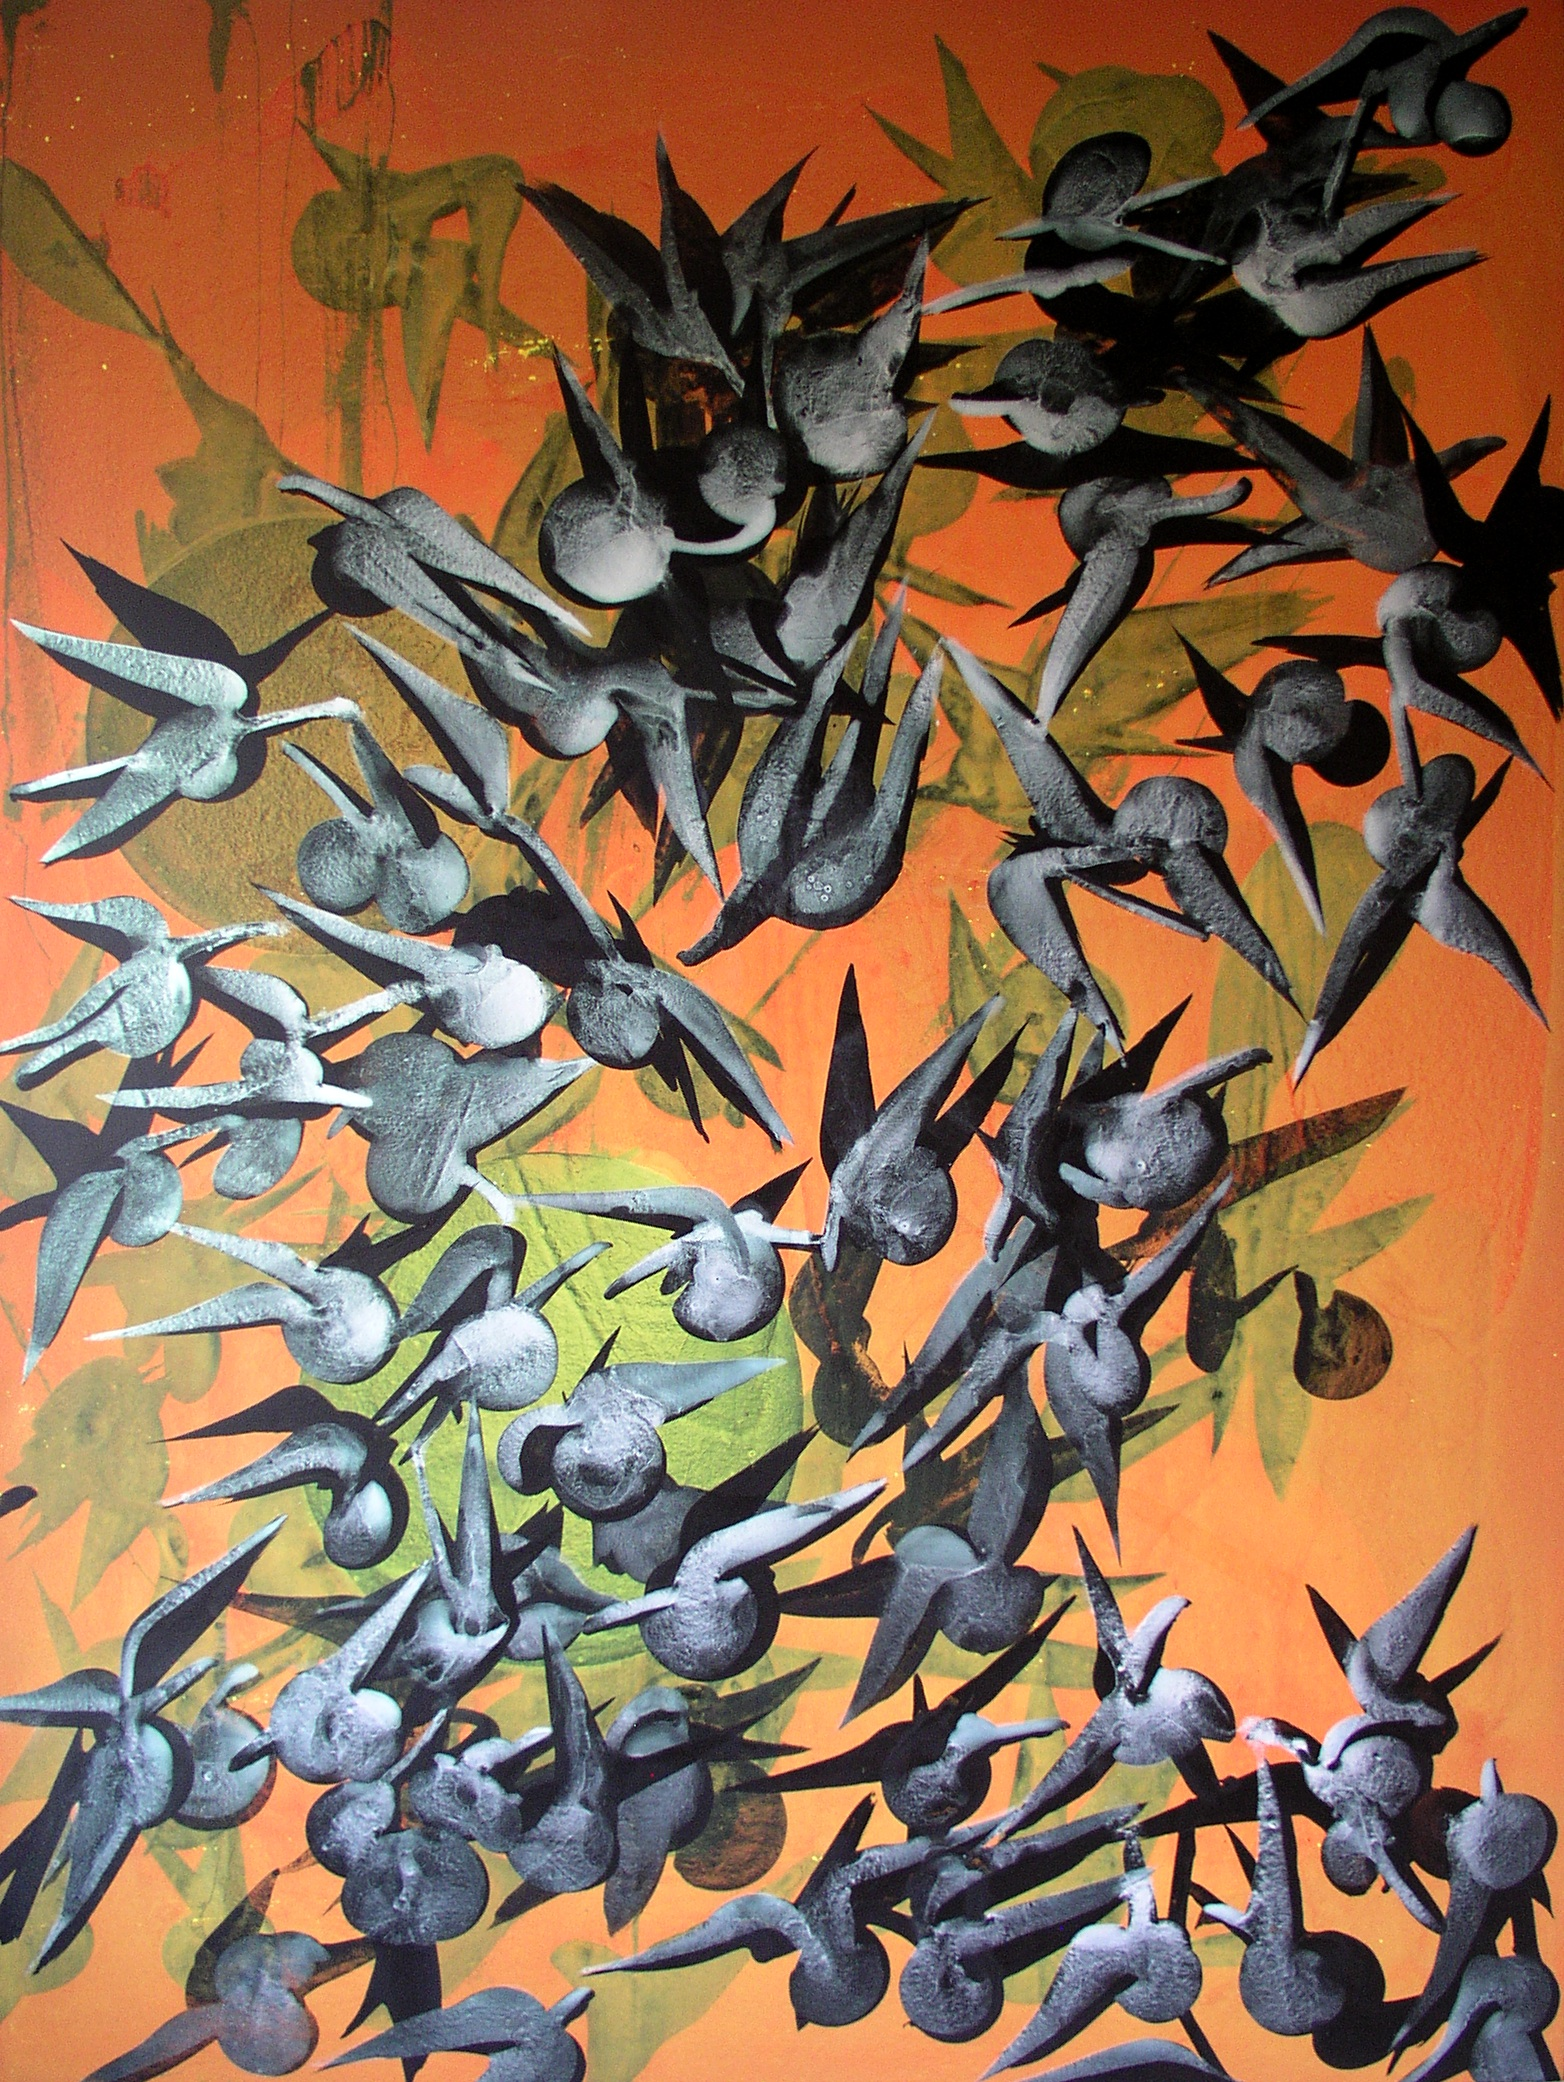 SoHyun Bae, Attack, 2008, acrylic on canvas, 200 x 150 cm